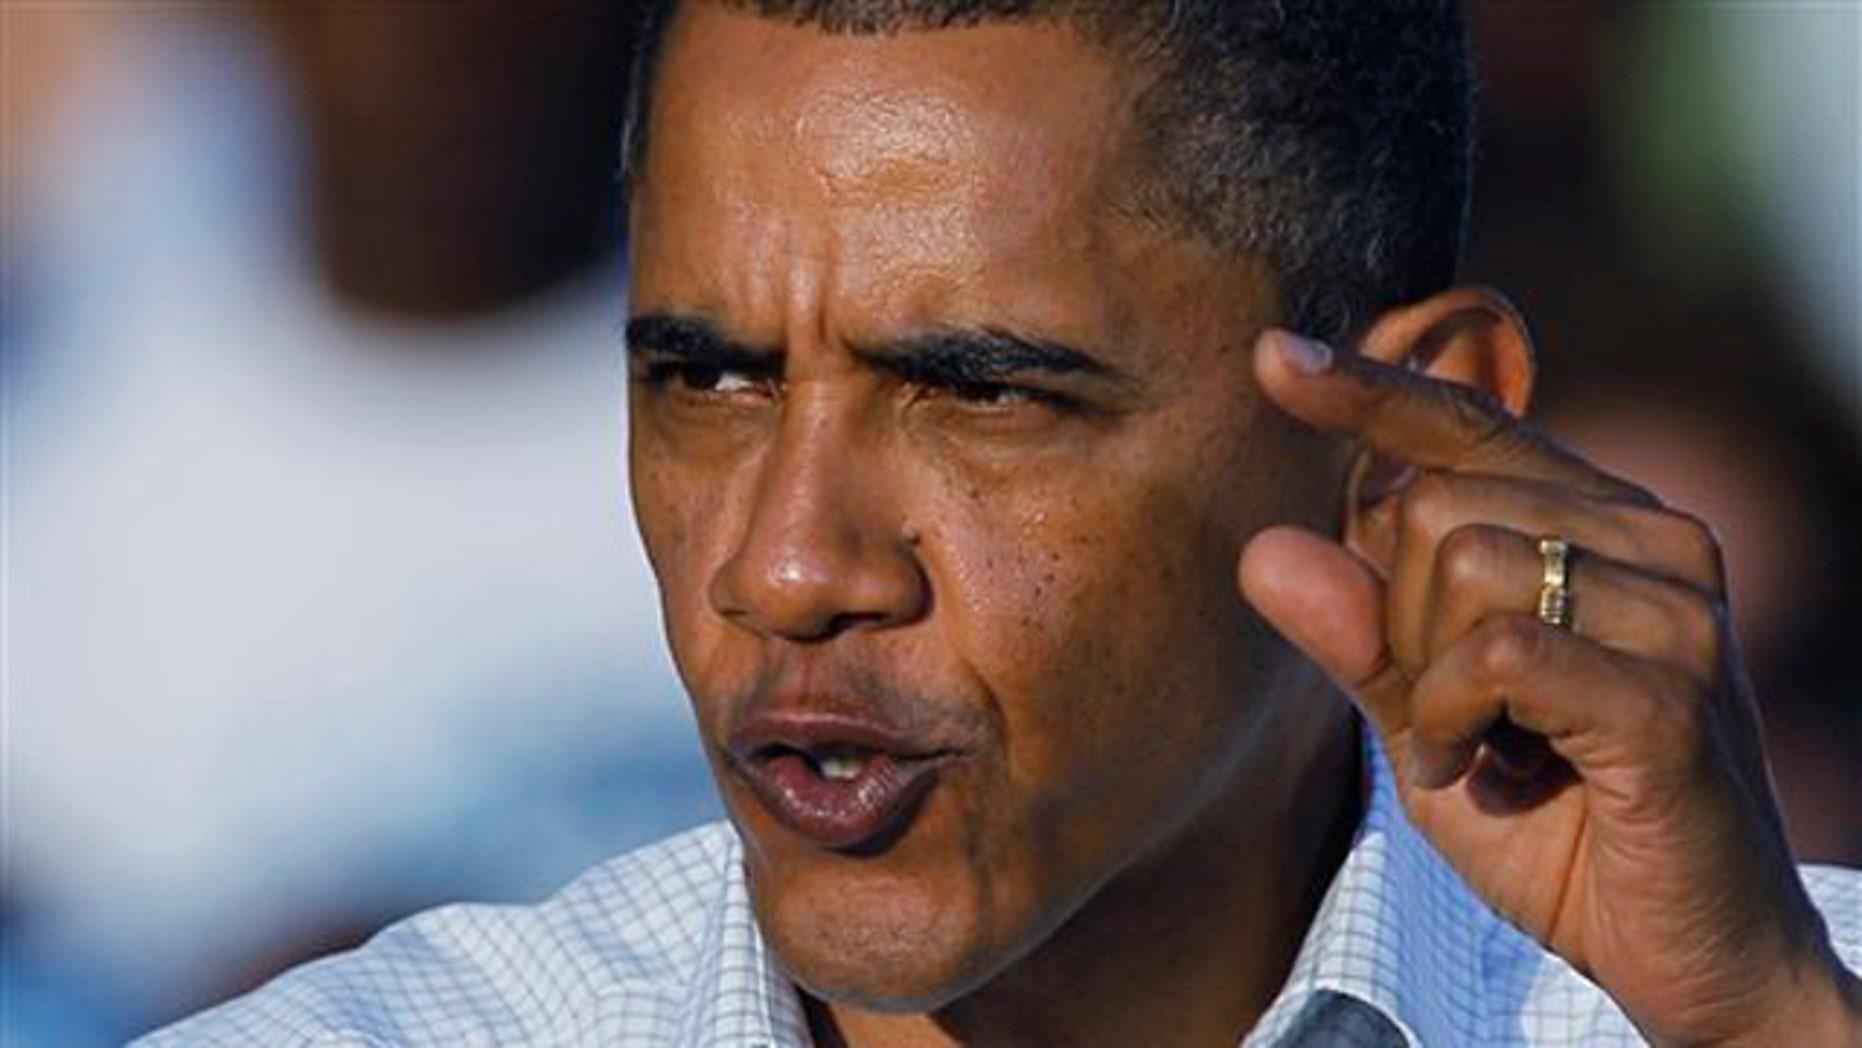 President Obama speaks at a rally in Philadelphia Oct. 10. (AP Photo)